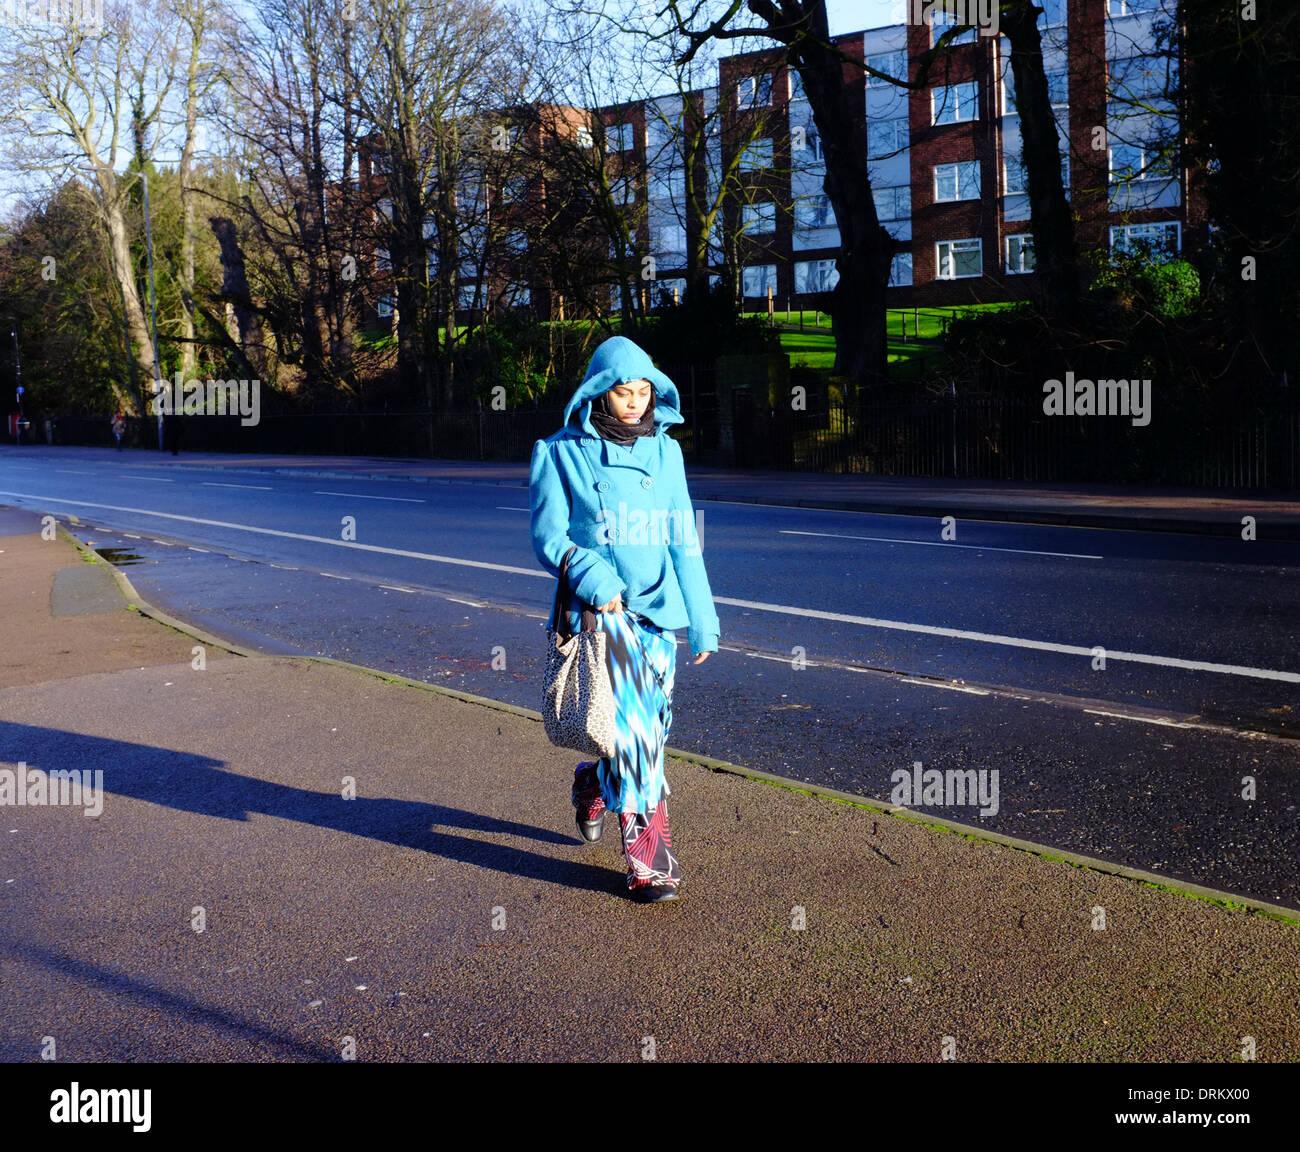 Asian woman in blue hooded coat walking in Luton - Stock Image